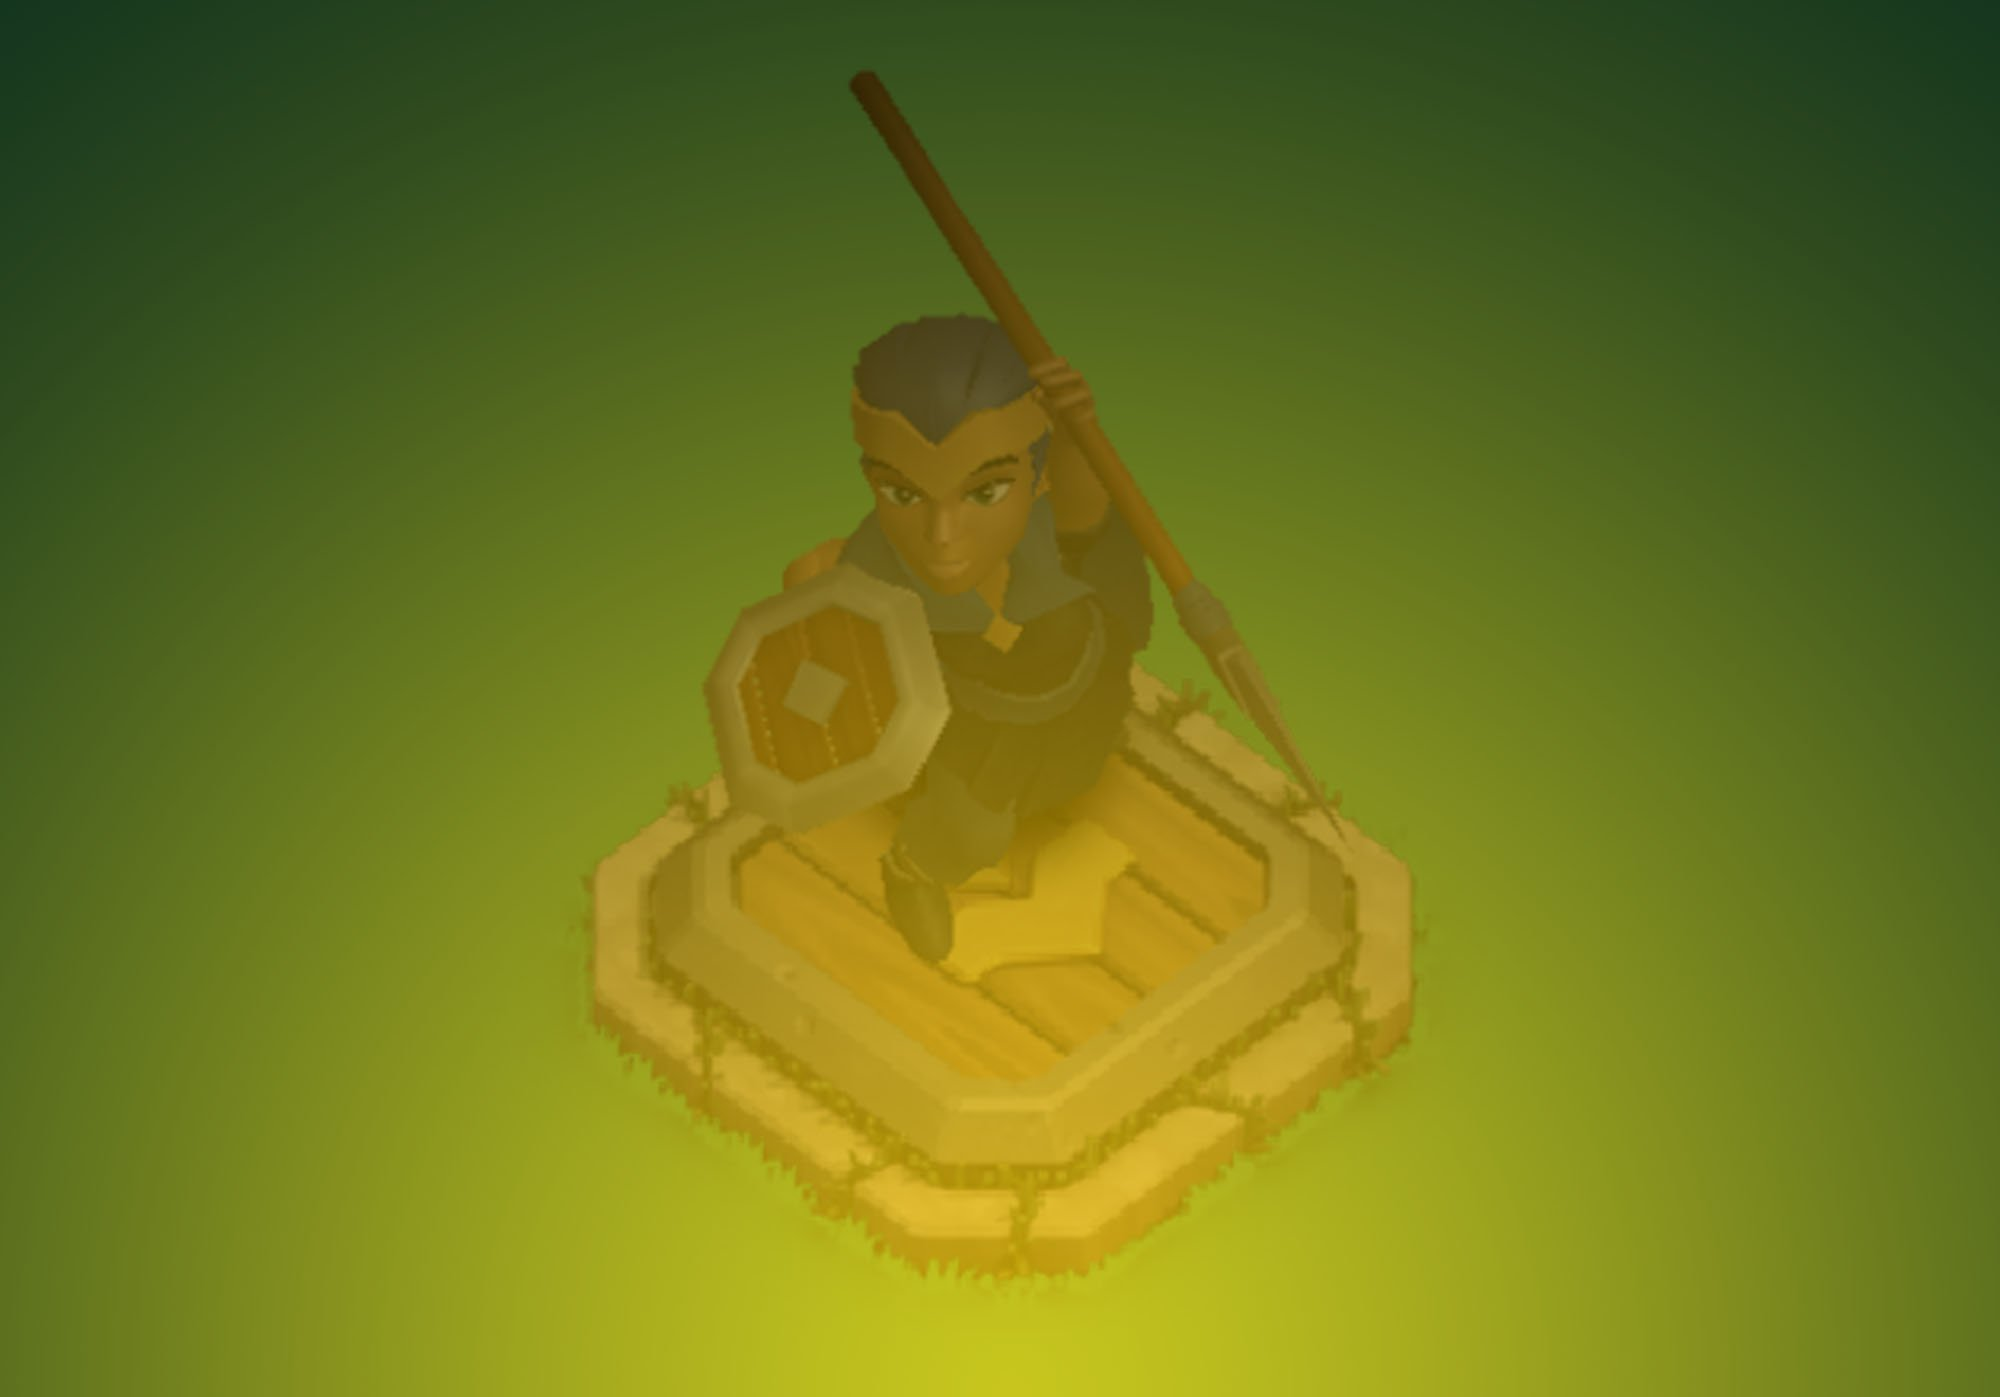 Clash of Clans Royal Champion Altar